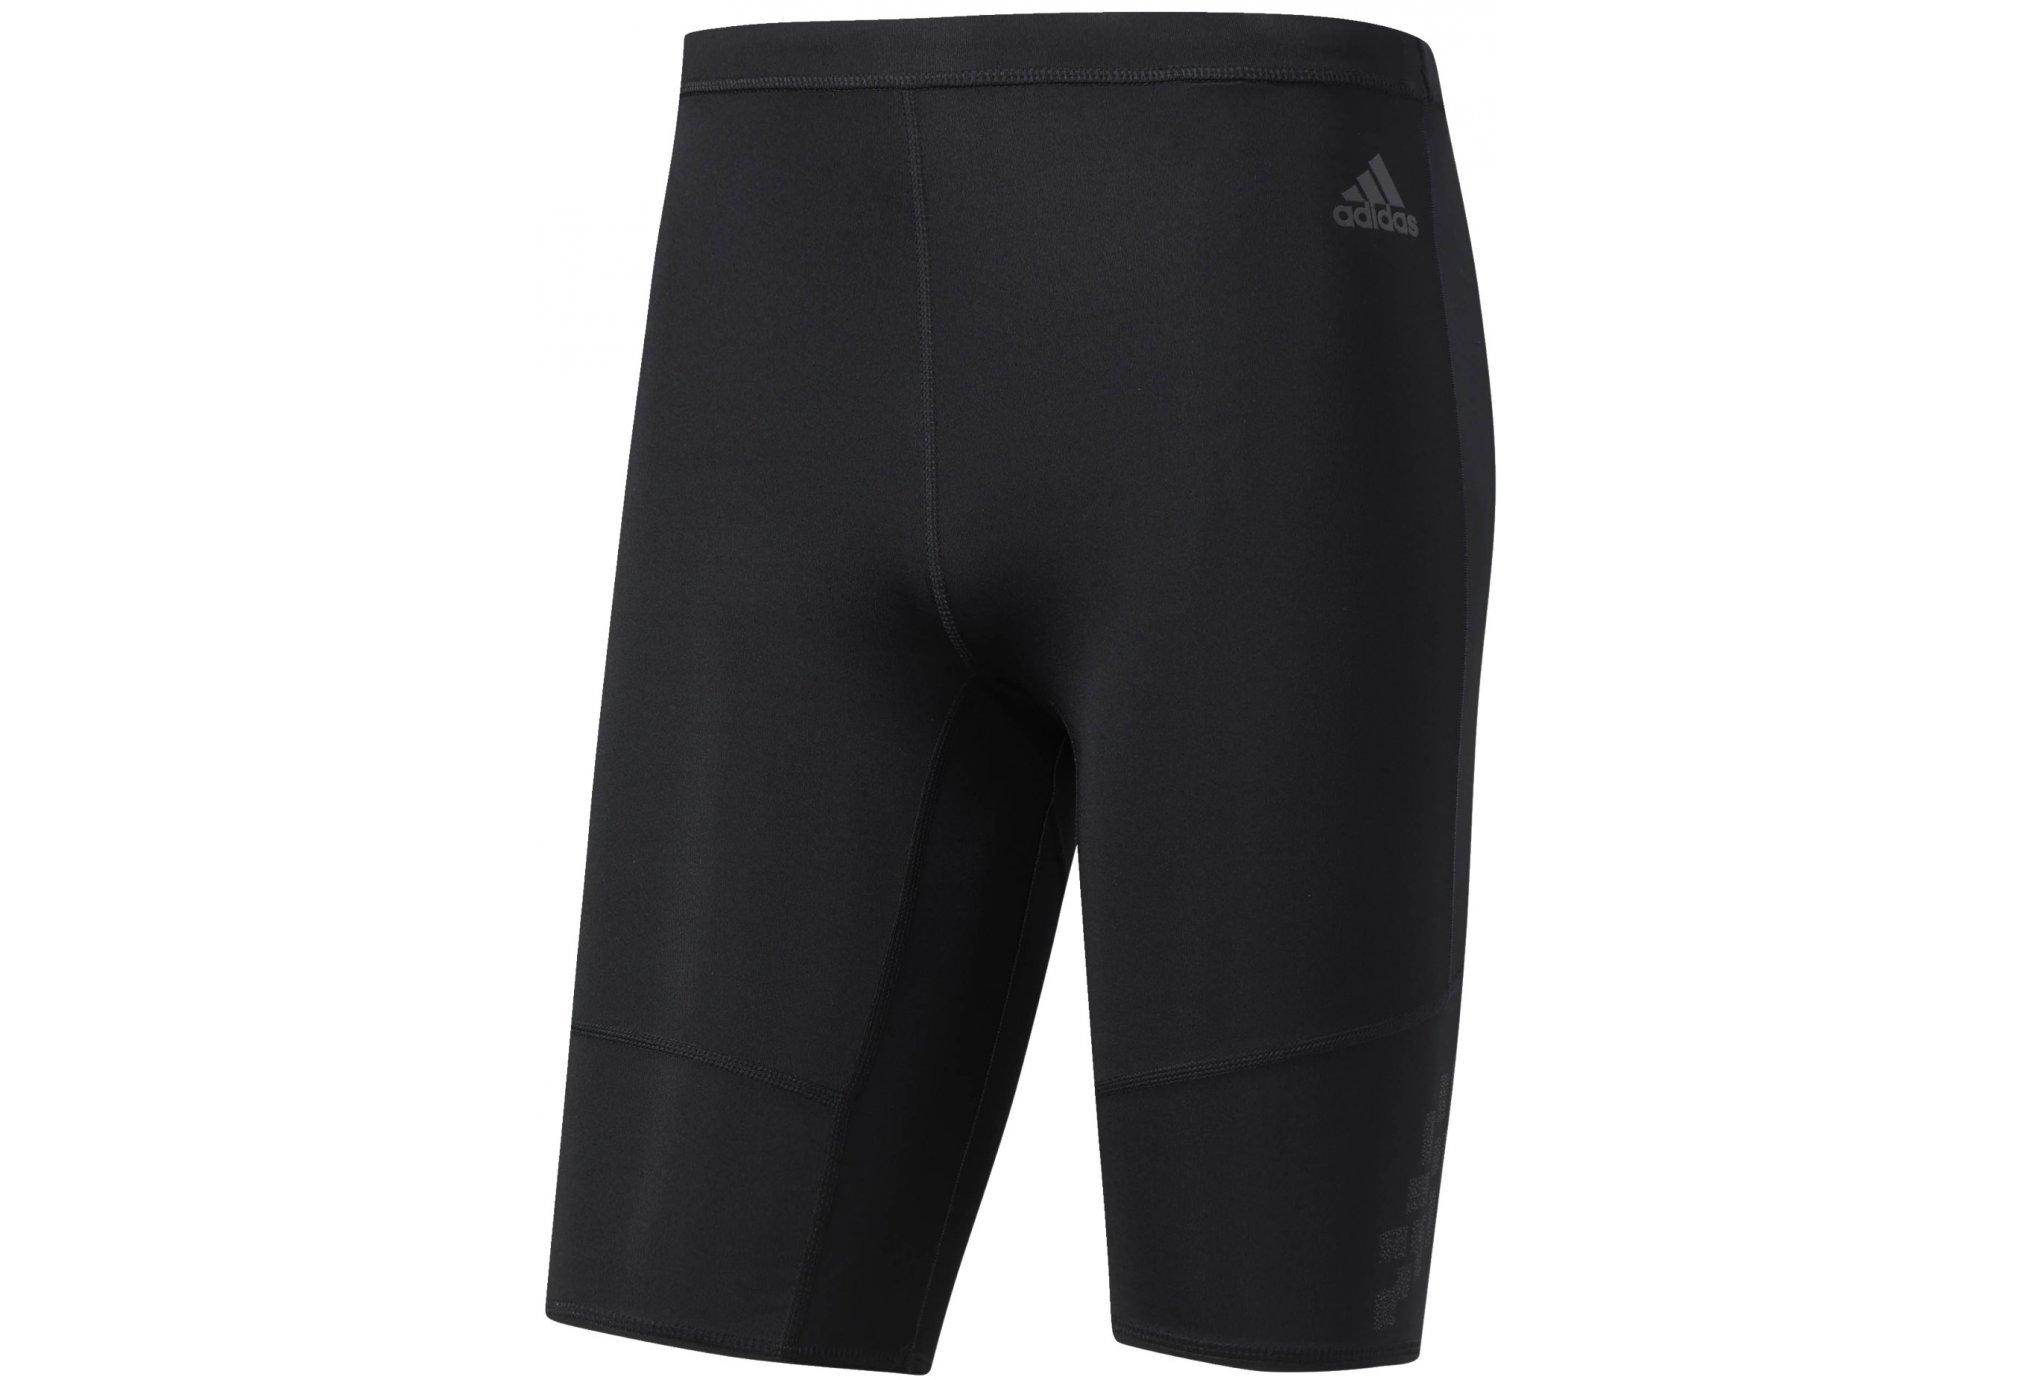 adidas Supernova Short Tight M vêtement running homme